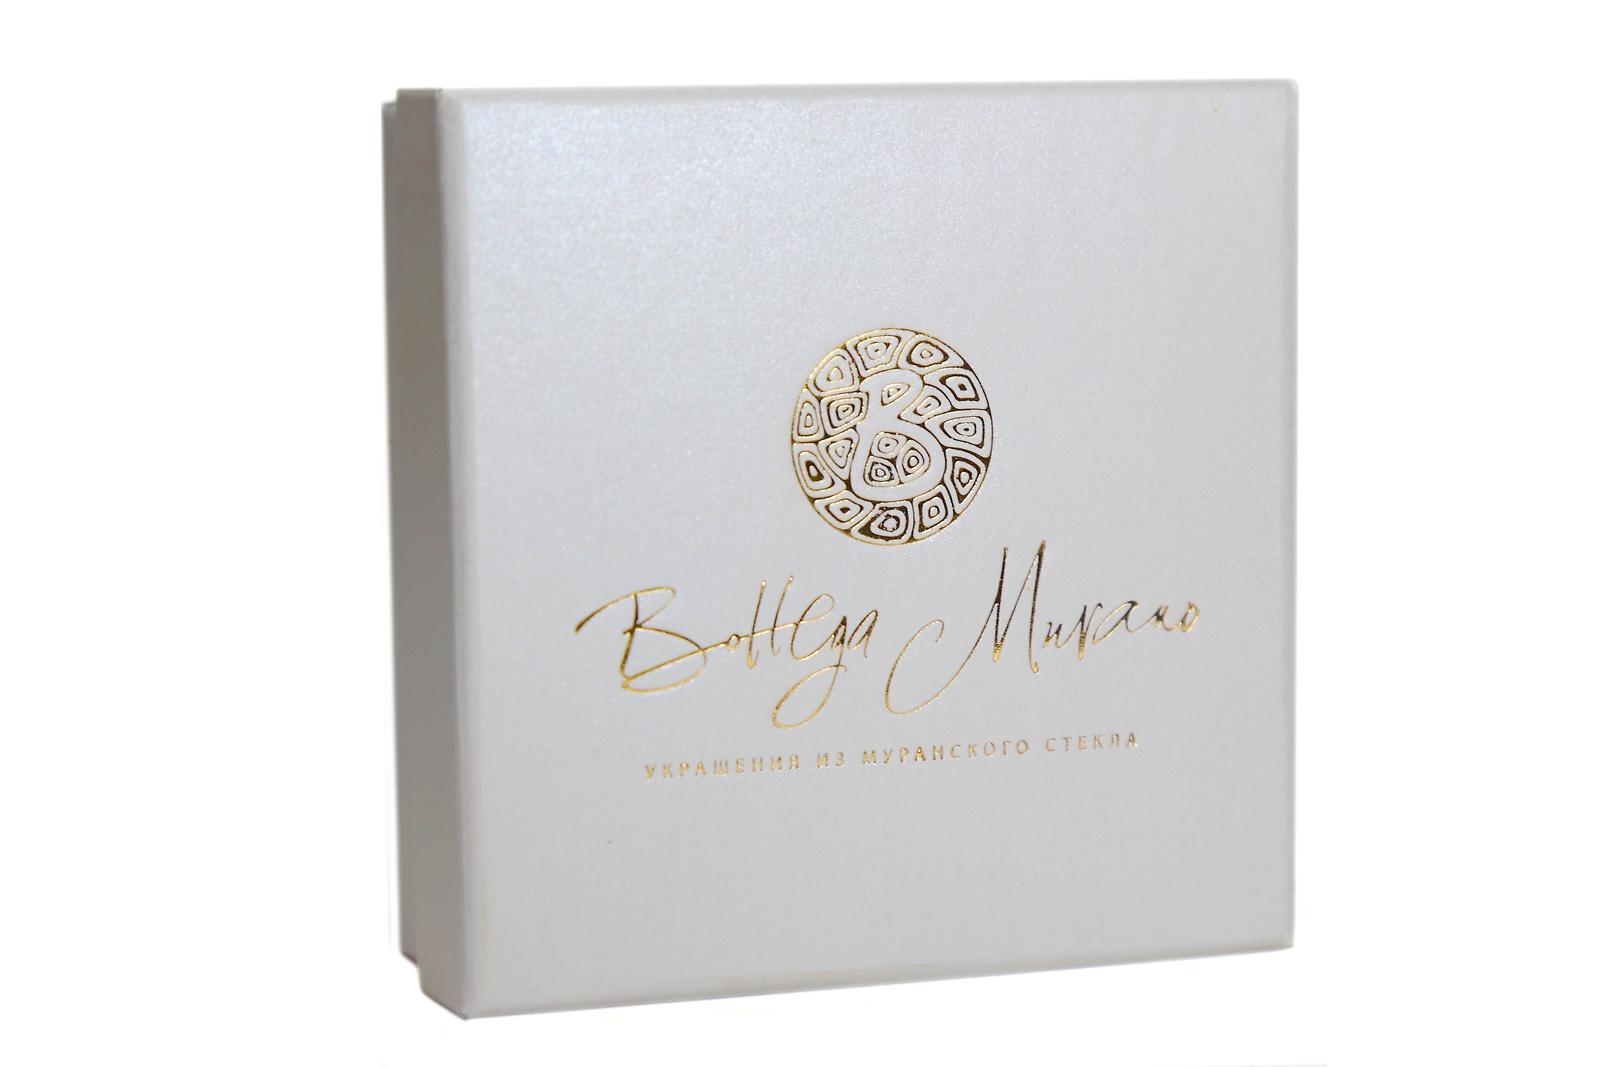 Комплект бижутерии Bottega Murano (5971)